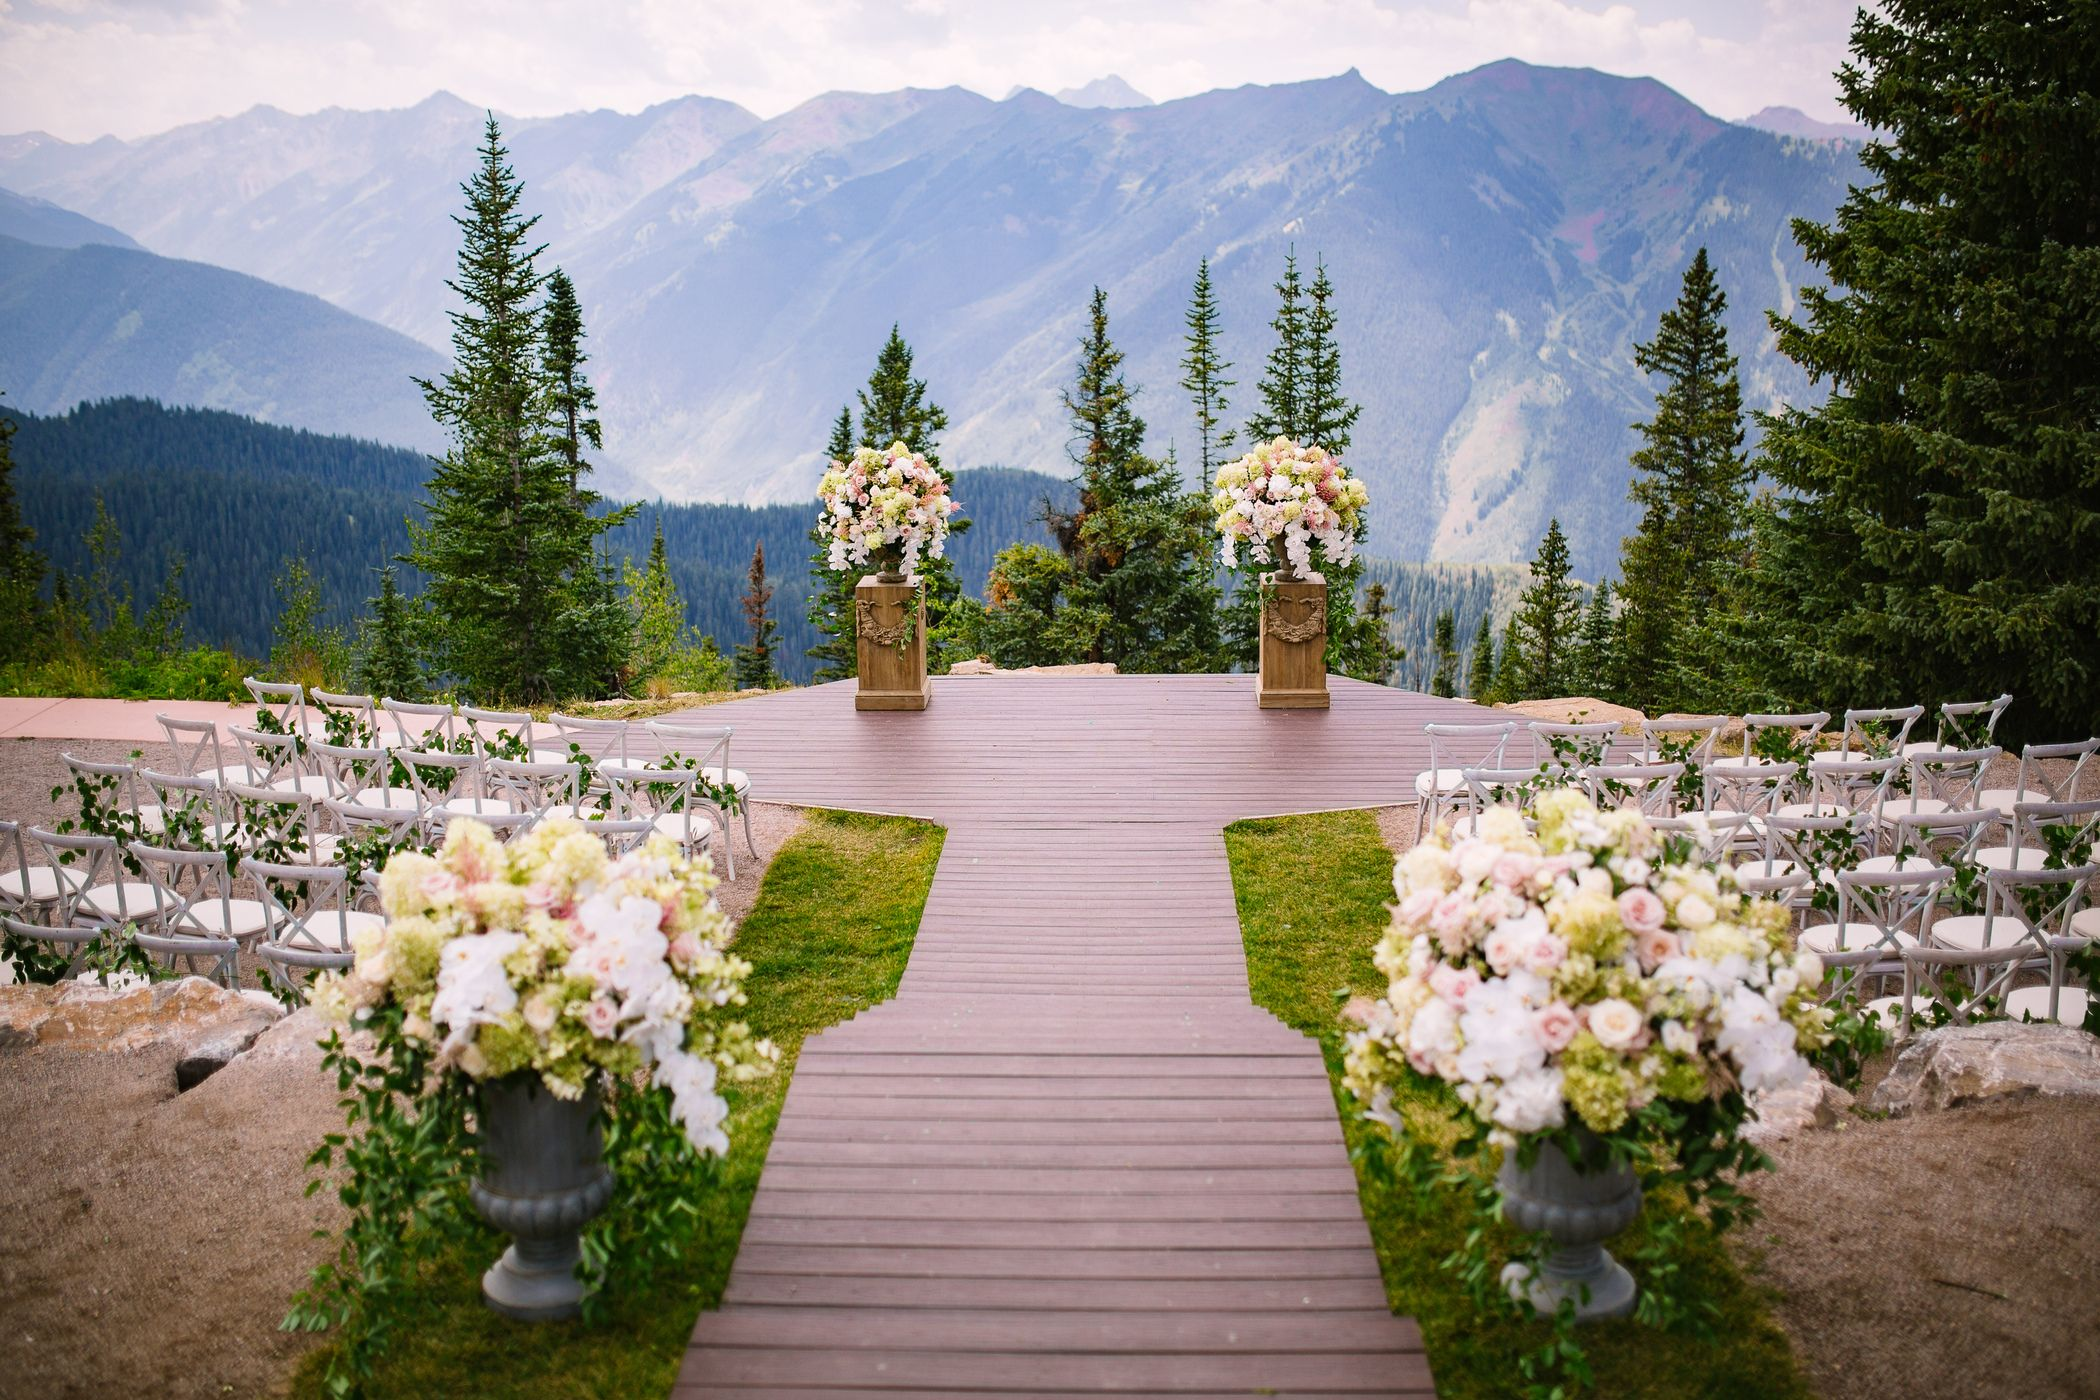 25 Fall Wedding Venues Best Locations For Fall Weddings